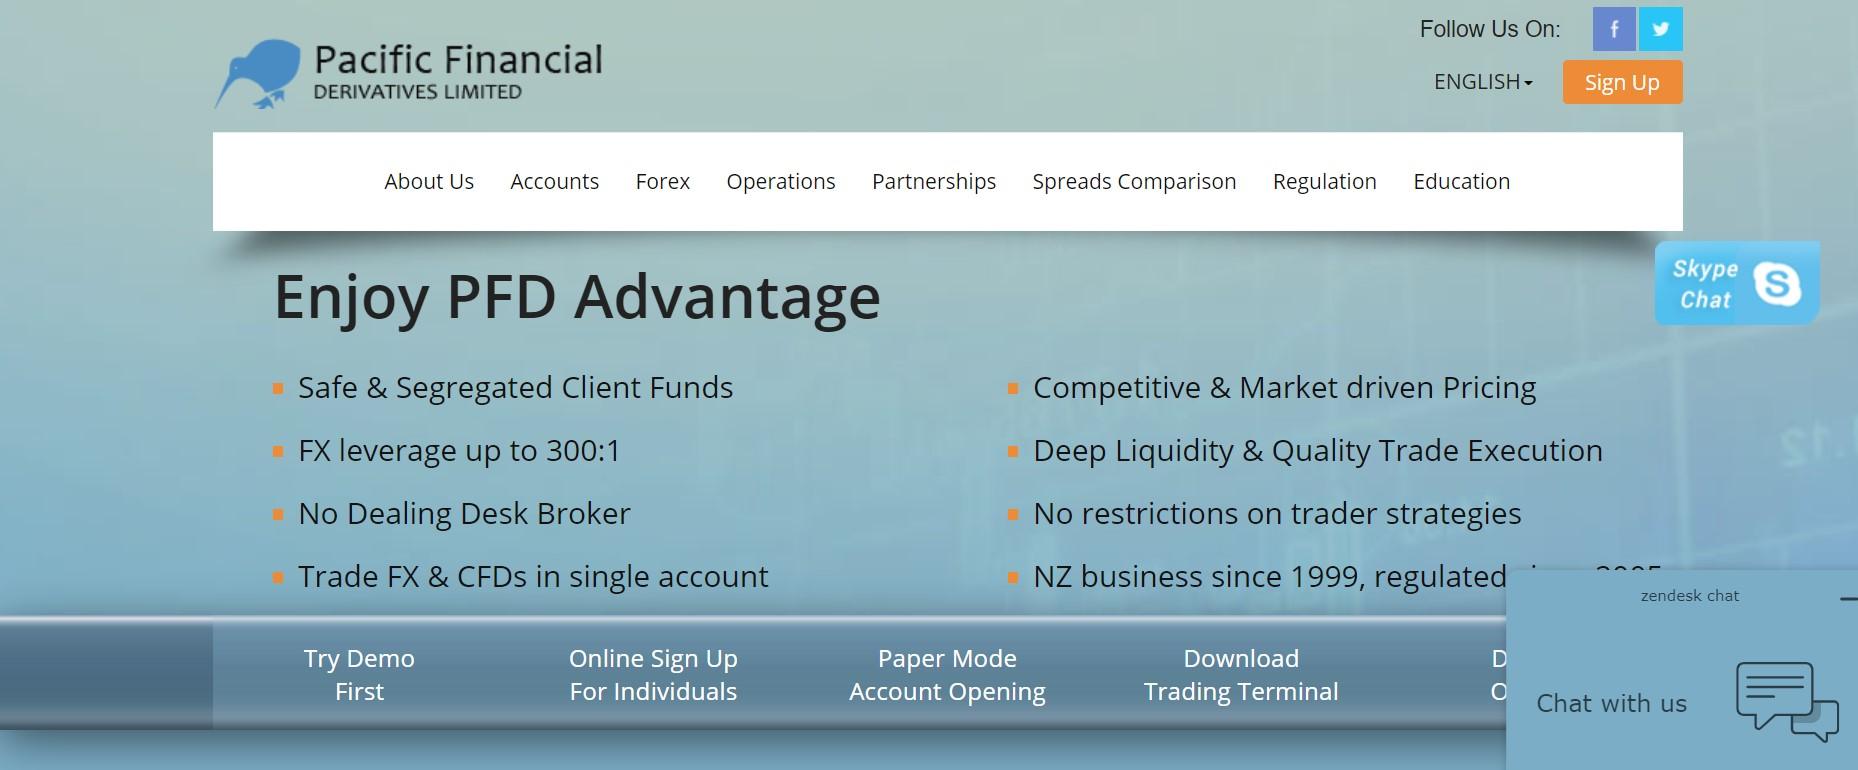 Pacific Financial Derivatives website